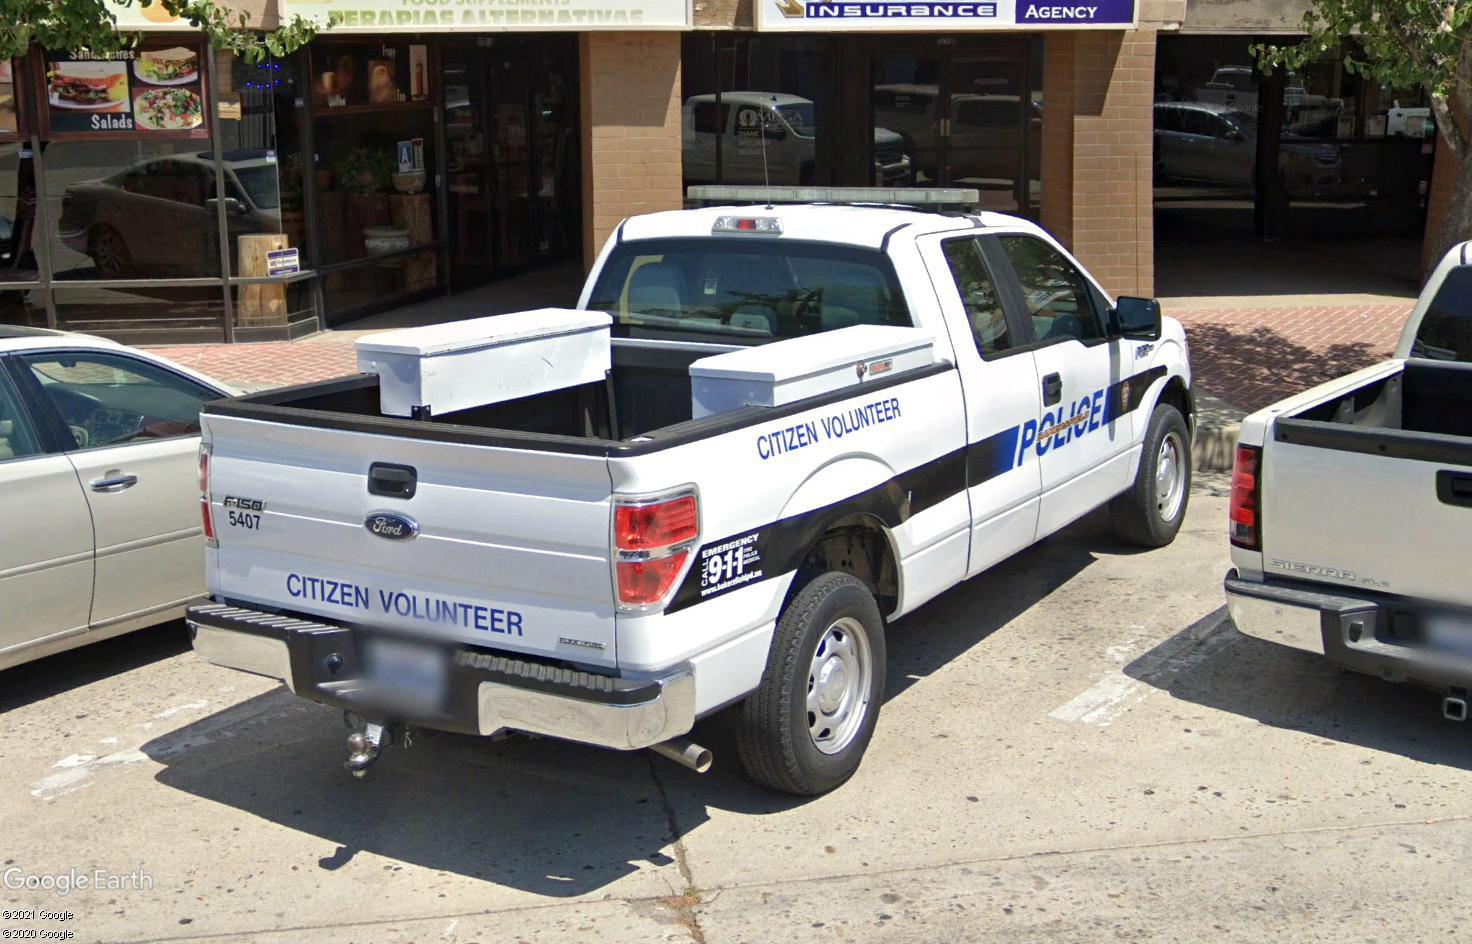 STREET VIEW : véhicules de police du monde - Page 10 Tsge1833